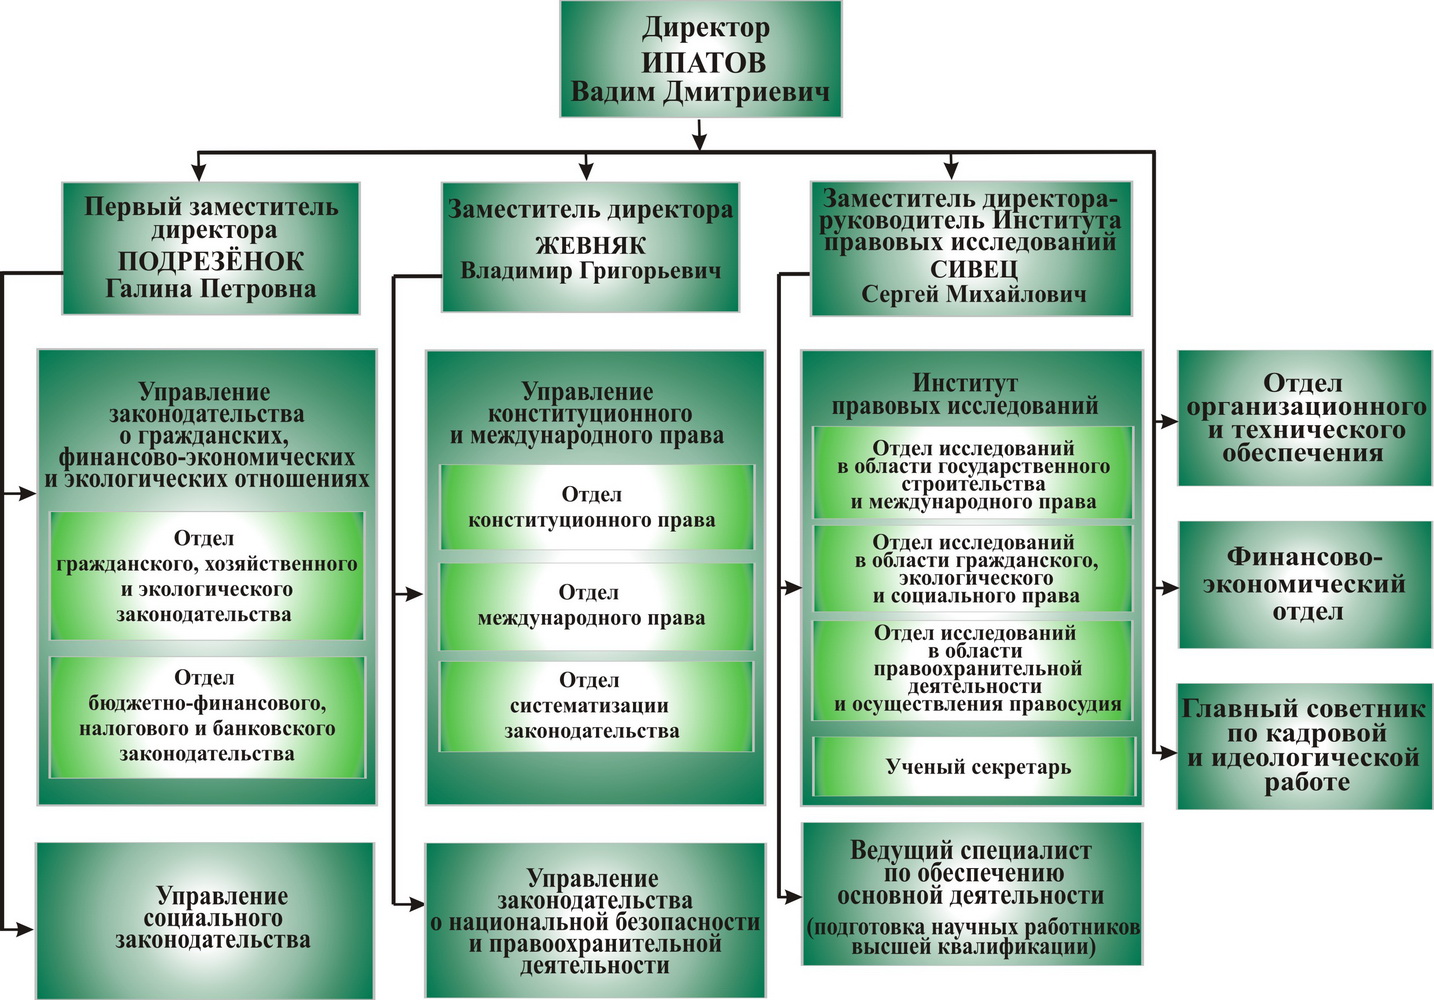 Структура НЦЗПИ